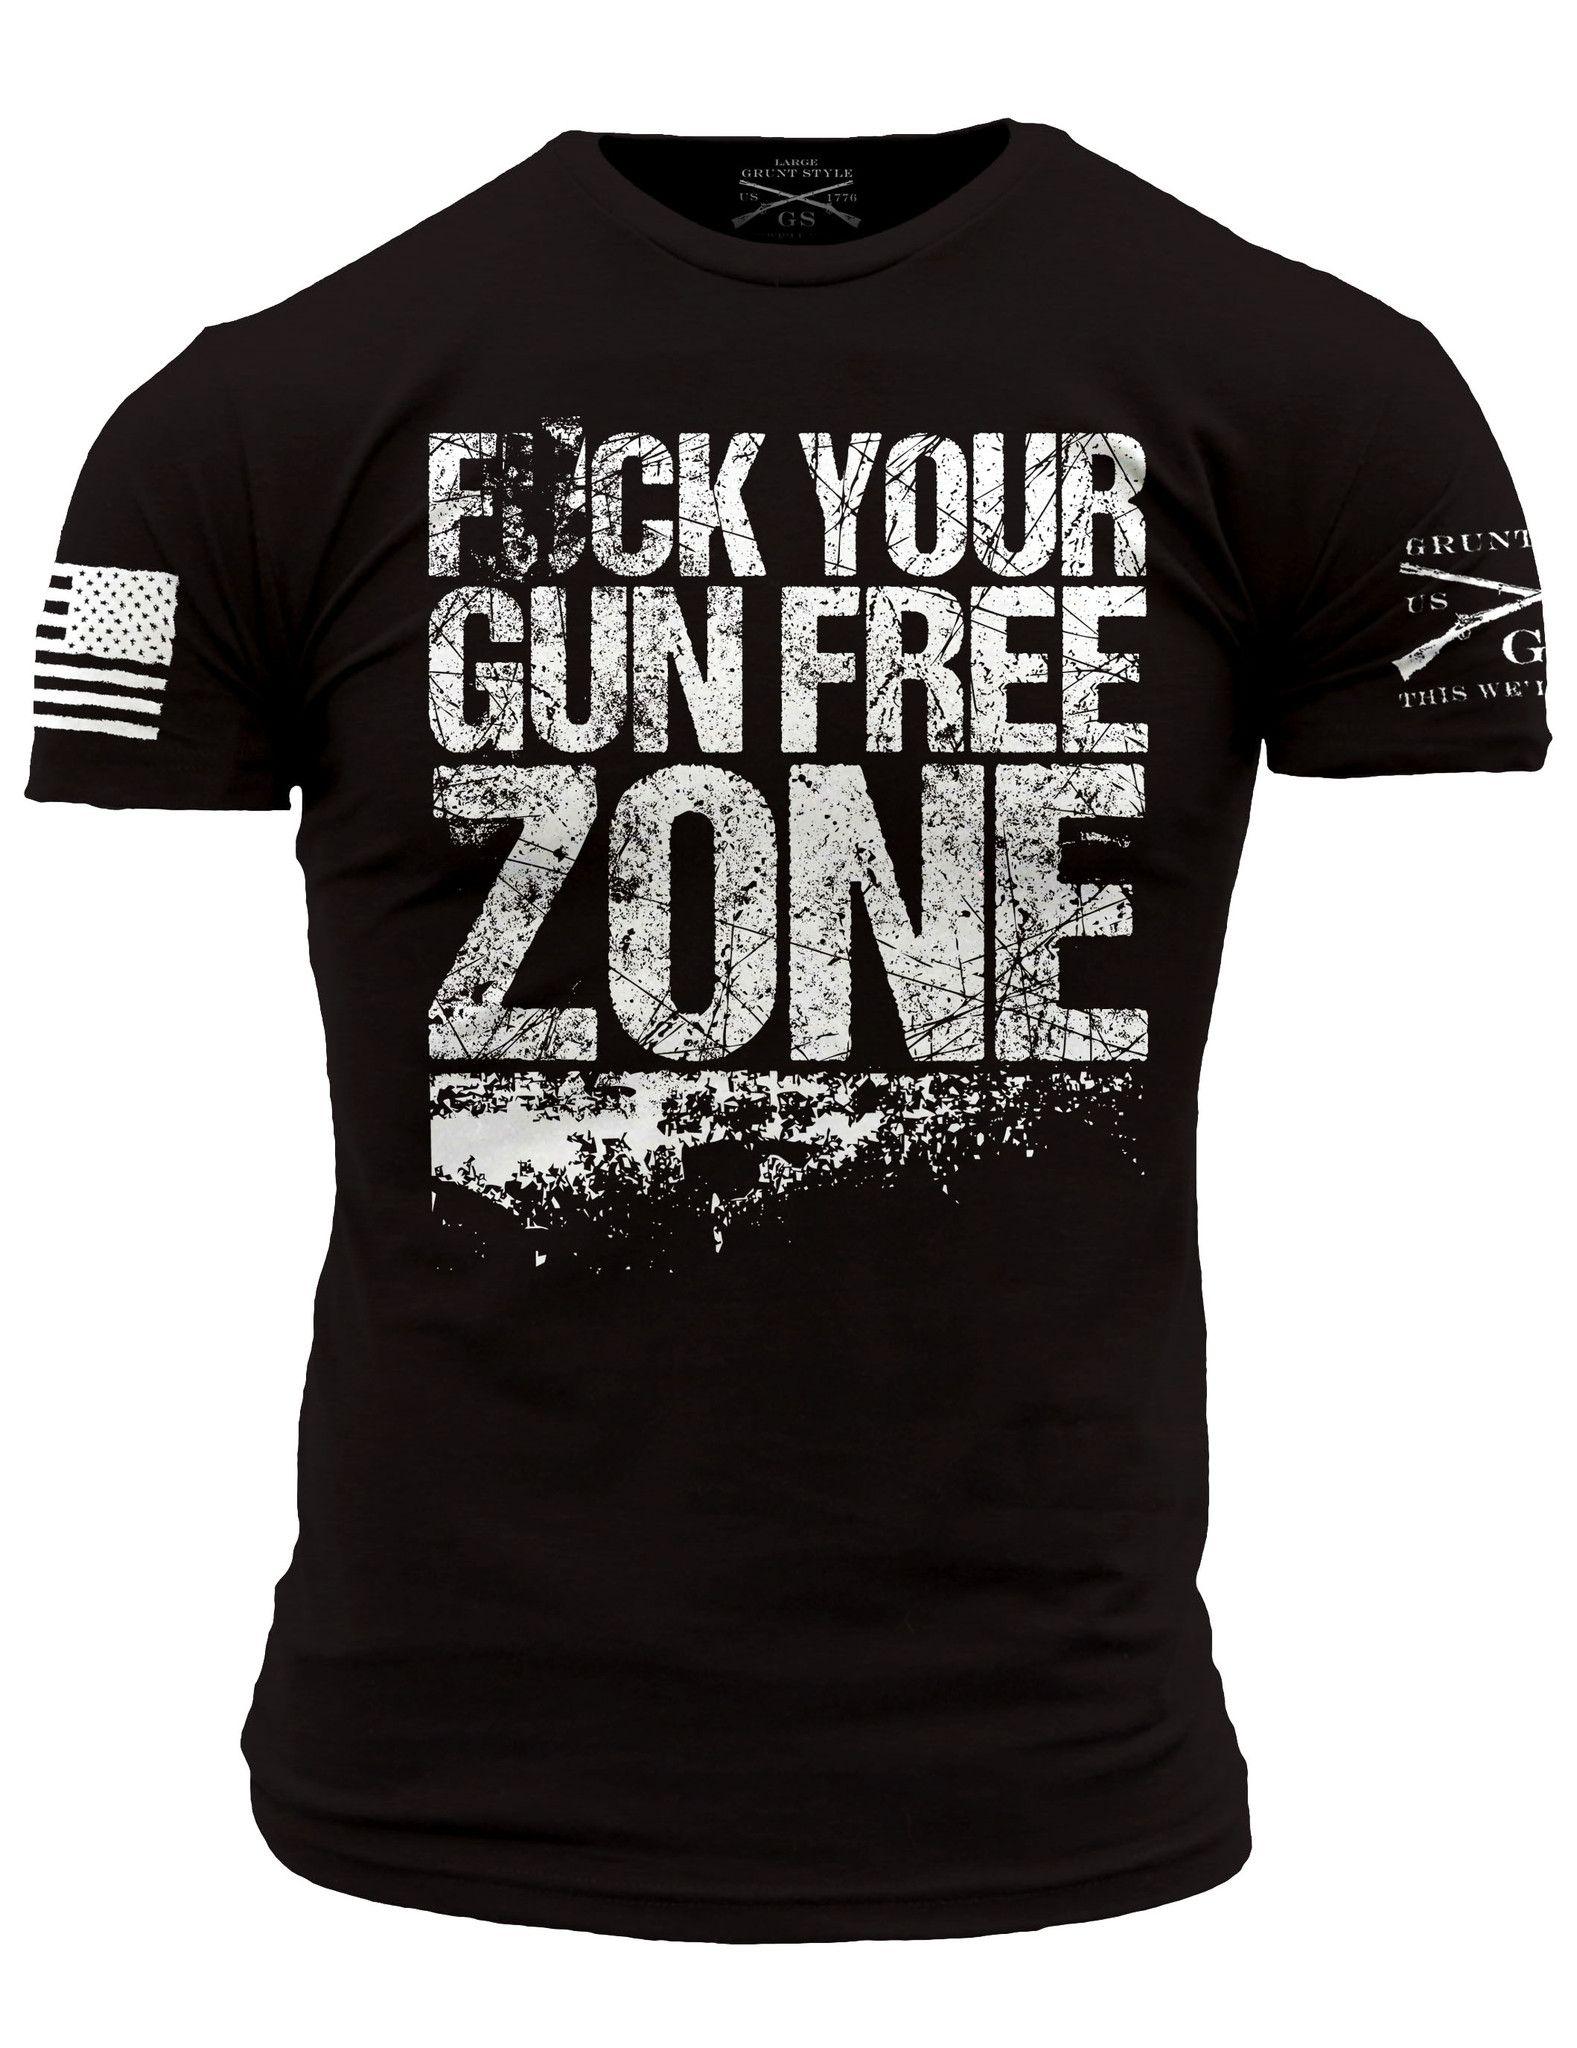 Fck Your Gun Free Zone T-Shirt- Grunt Style Men's Graphic Tee Shirt